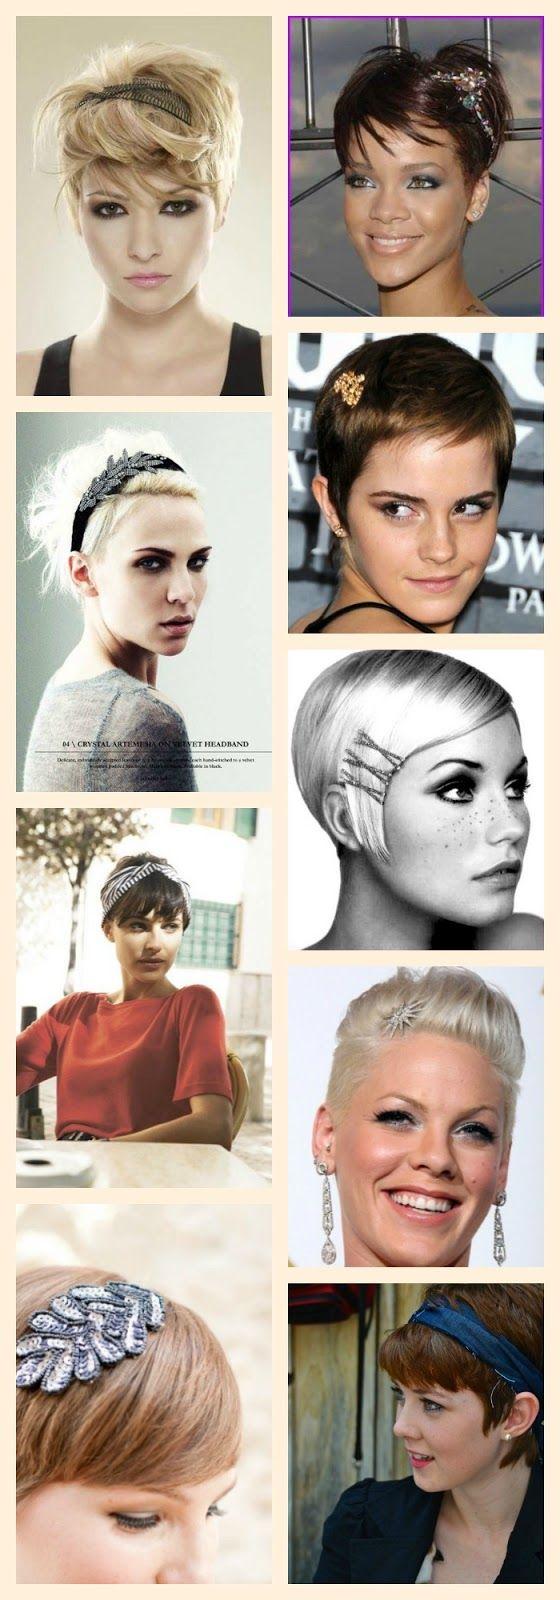 Pleasing 1000 Ideas About Short Hair Accessories On Pinterest Hairstyles Short Hairstyles Gunalazisus